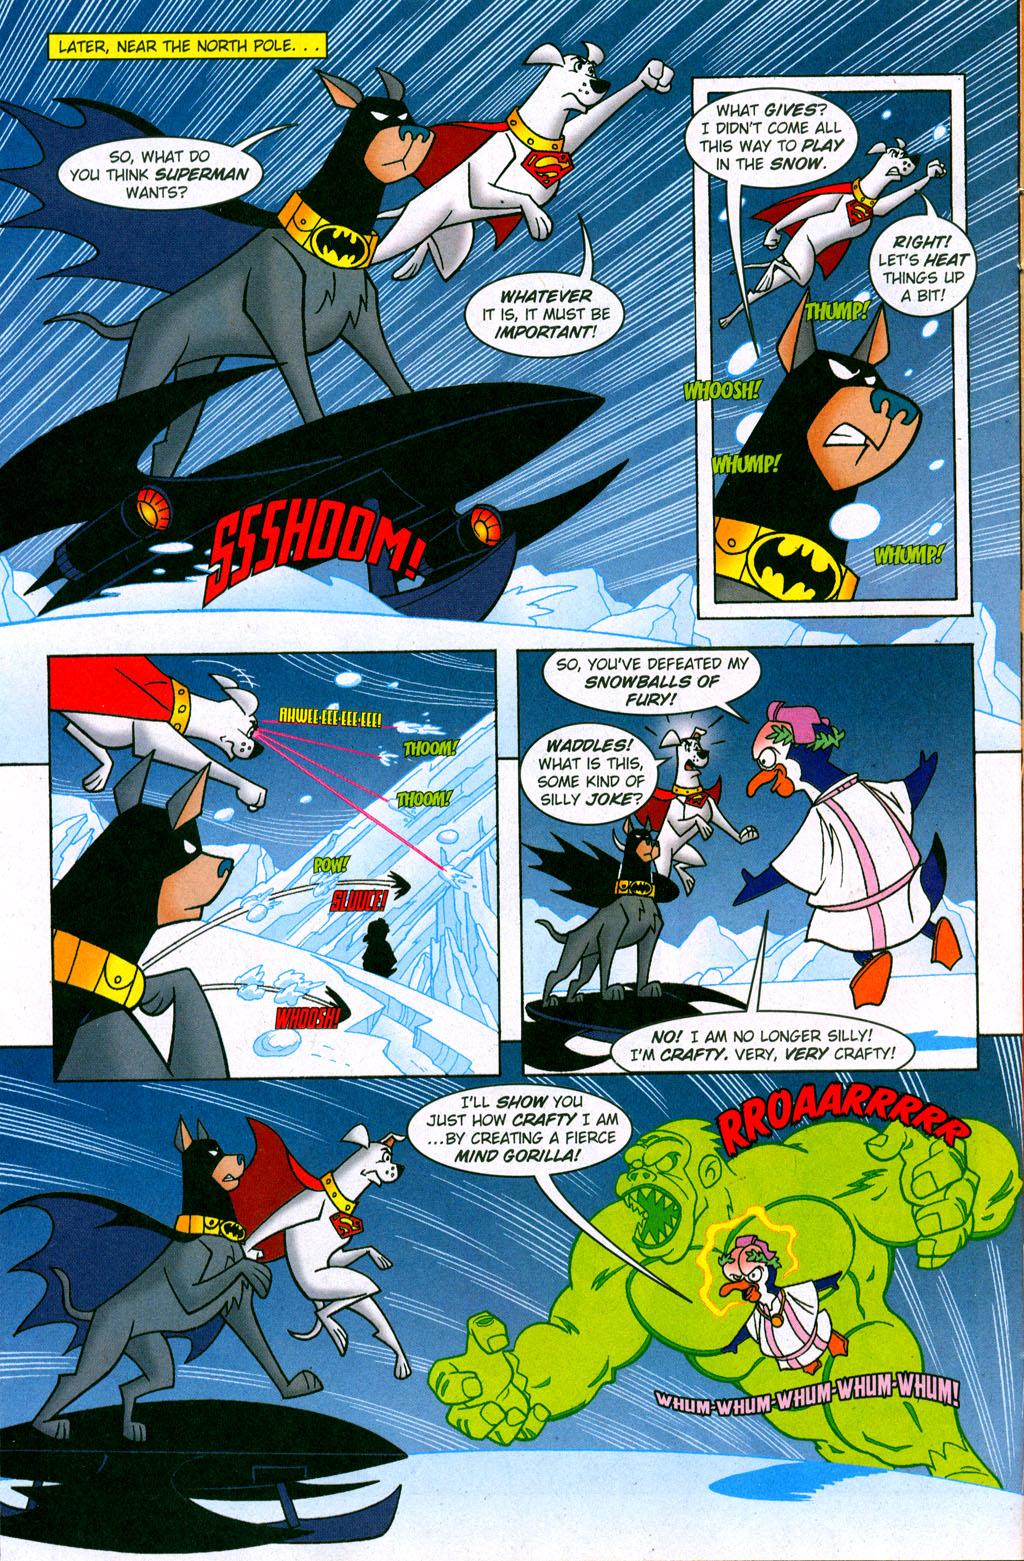 Read online Krypto the Superdog comic -  Issue #3 - 17